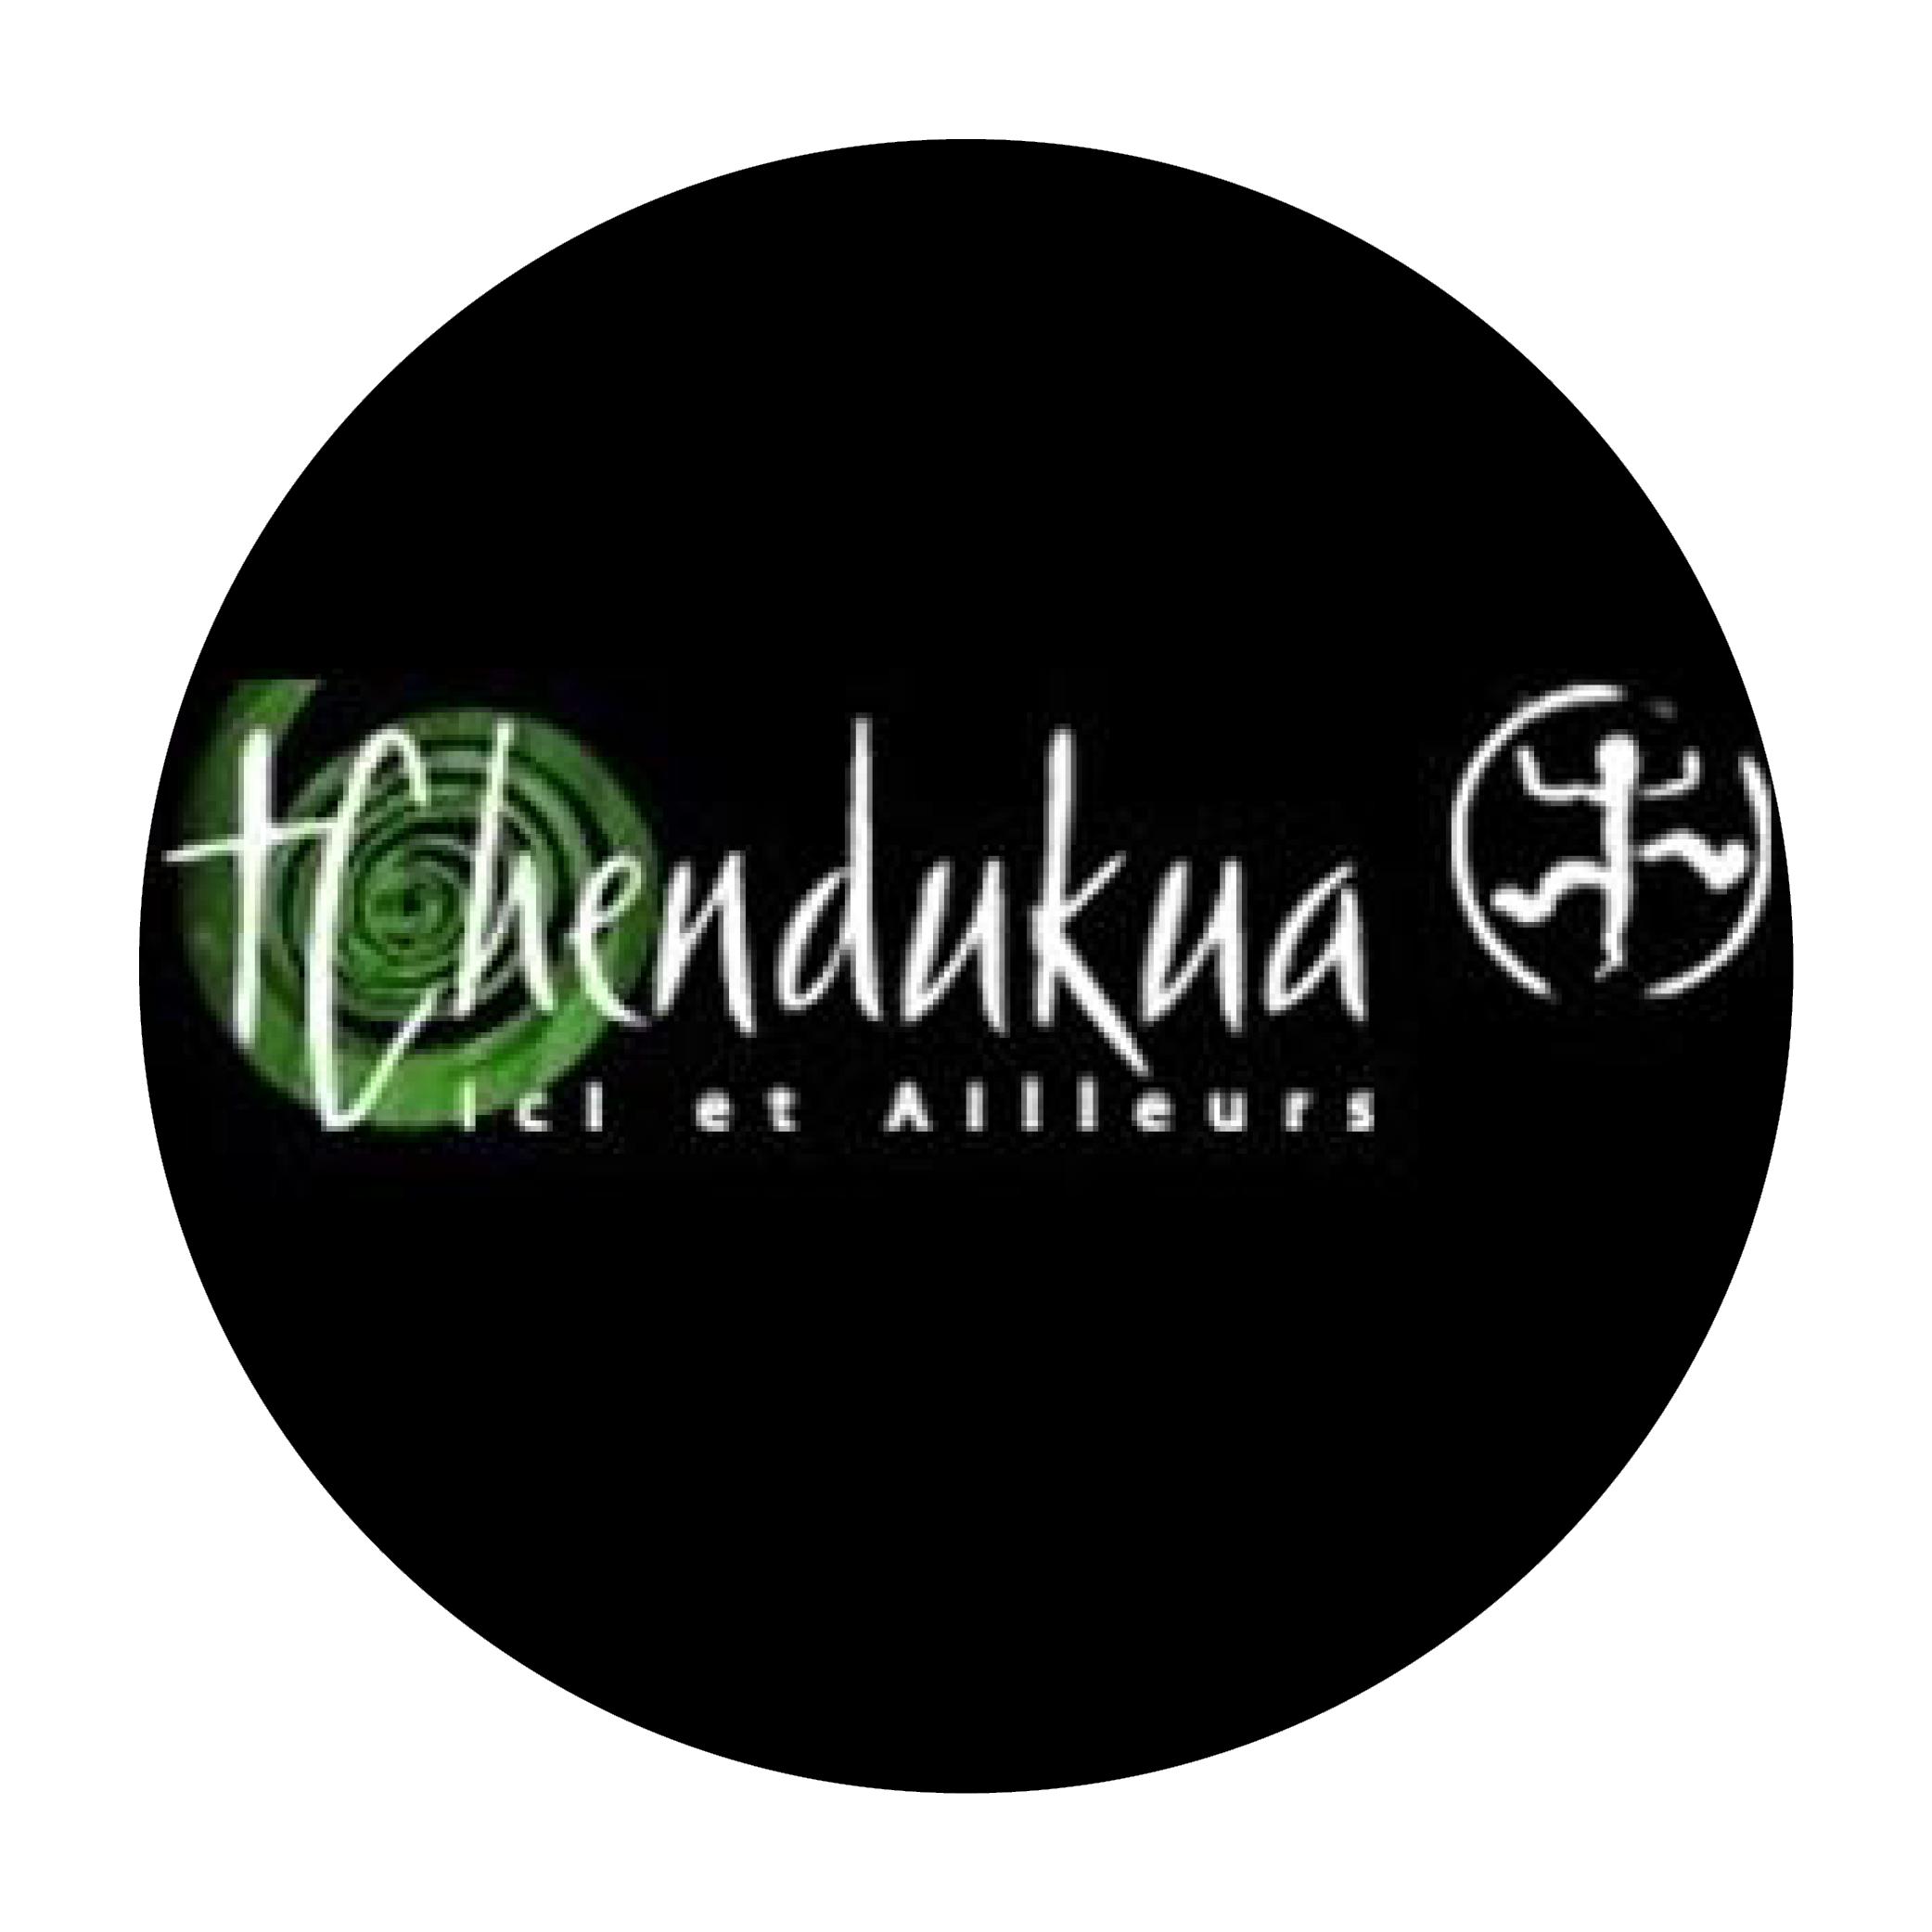 macaron_tchendukua_web.png